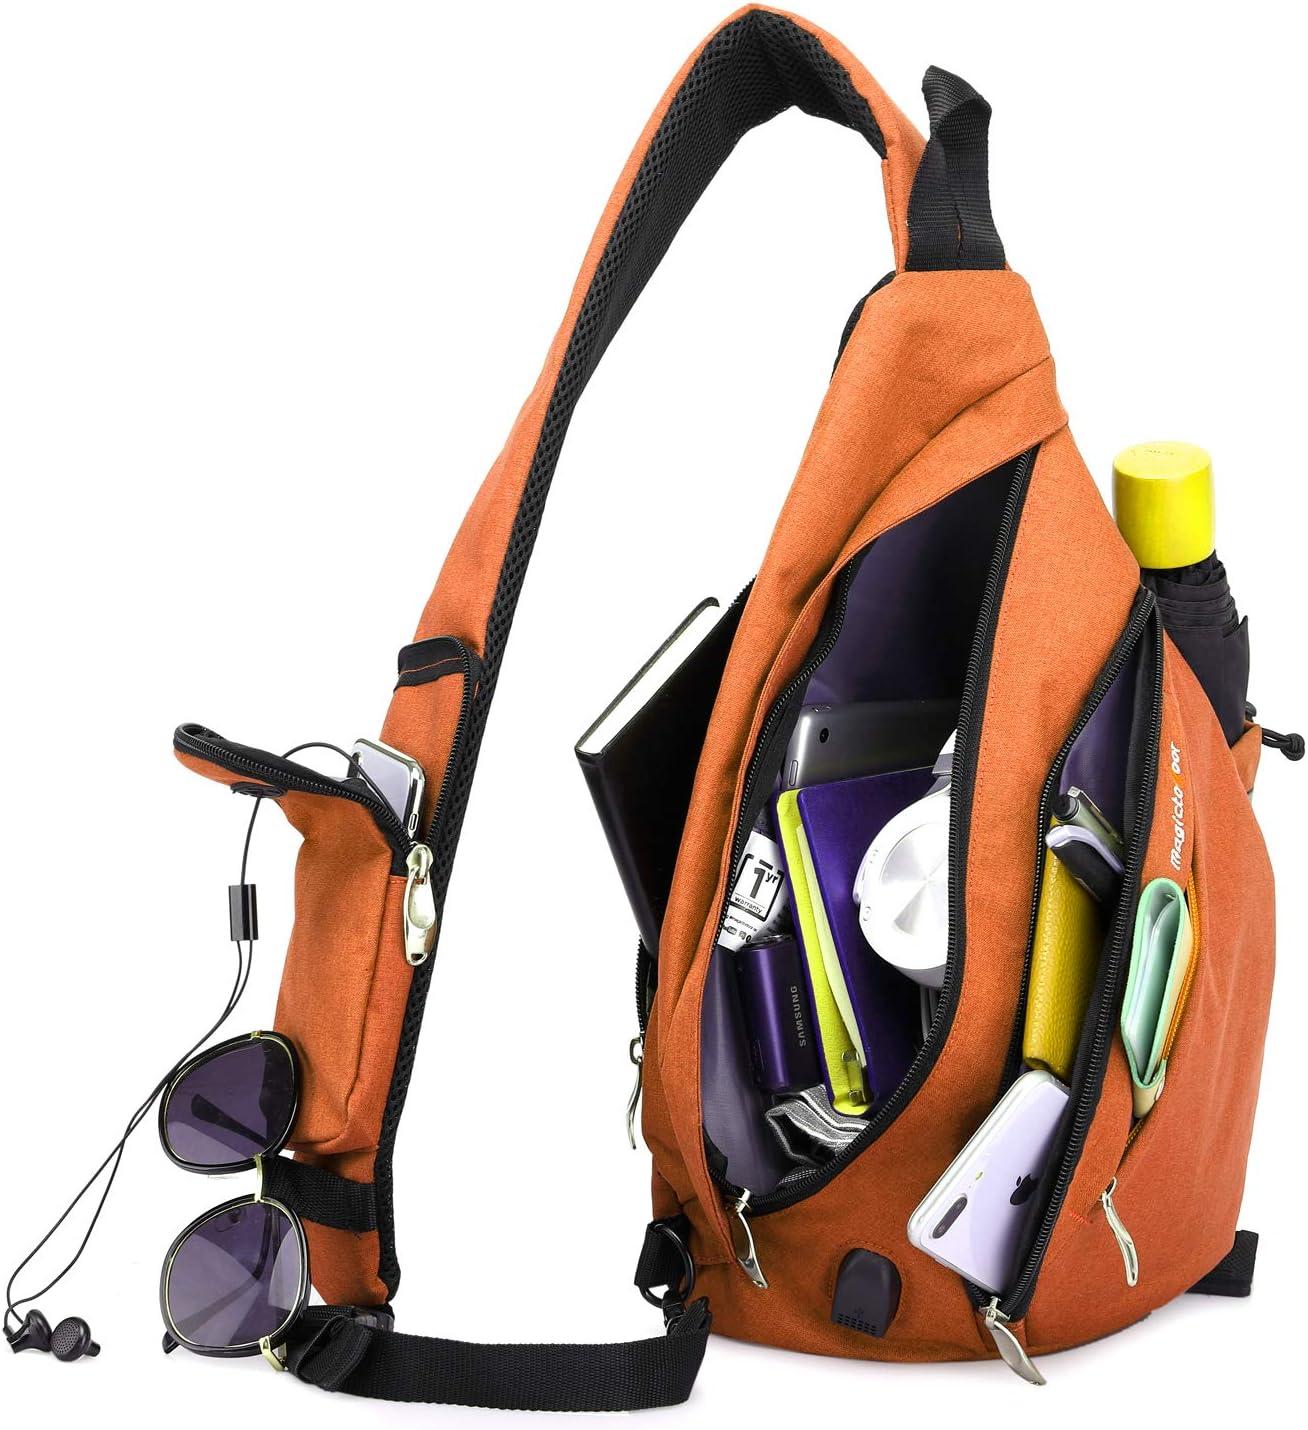 Sling Bag Travel Backpack Wear Over Shoulder or Crossbody Reflection Straps for Hiking,Cycling